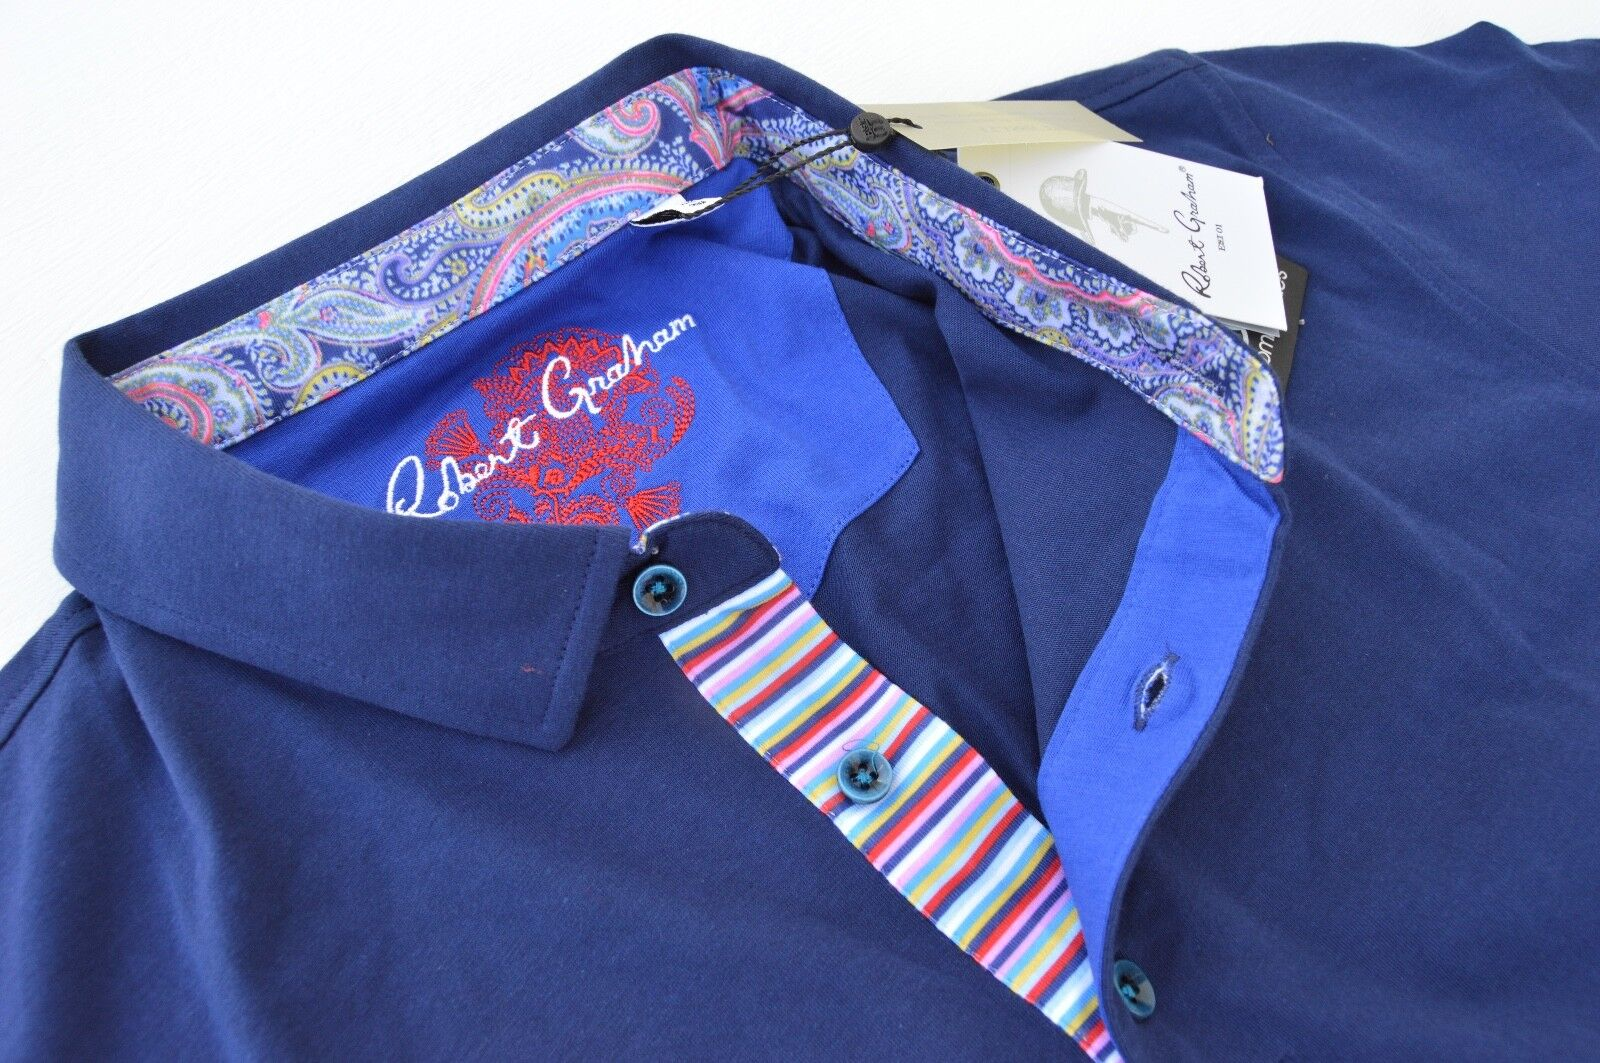 NWT  Robert Graham Mens STOKED polo shirt short sleeve size XL Casual Shirt